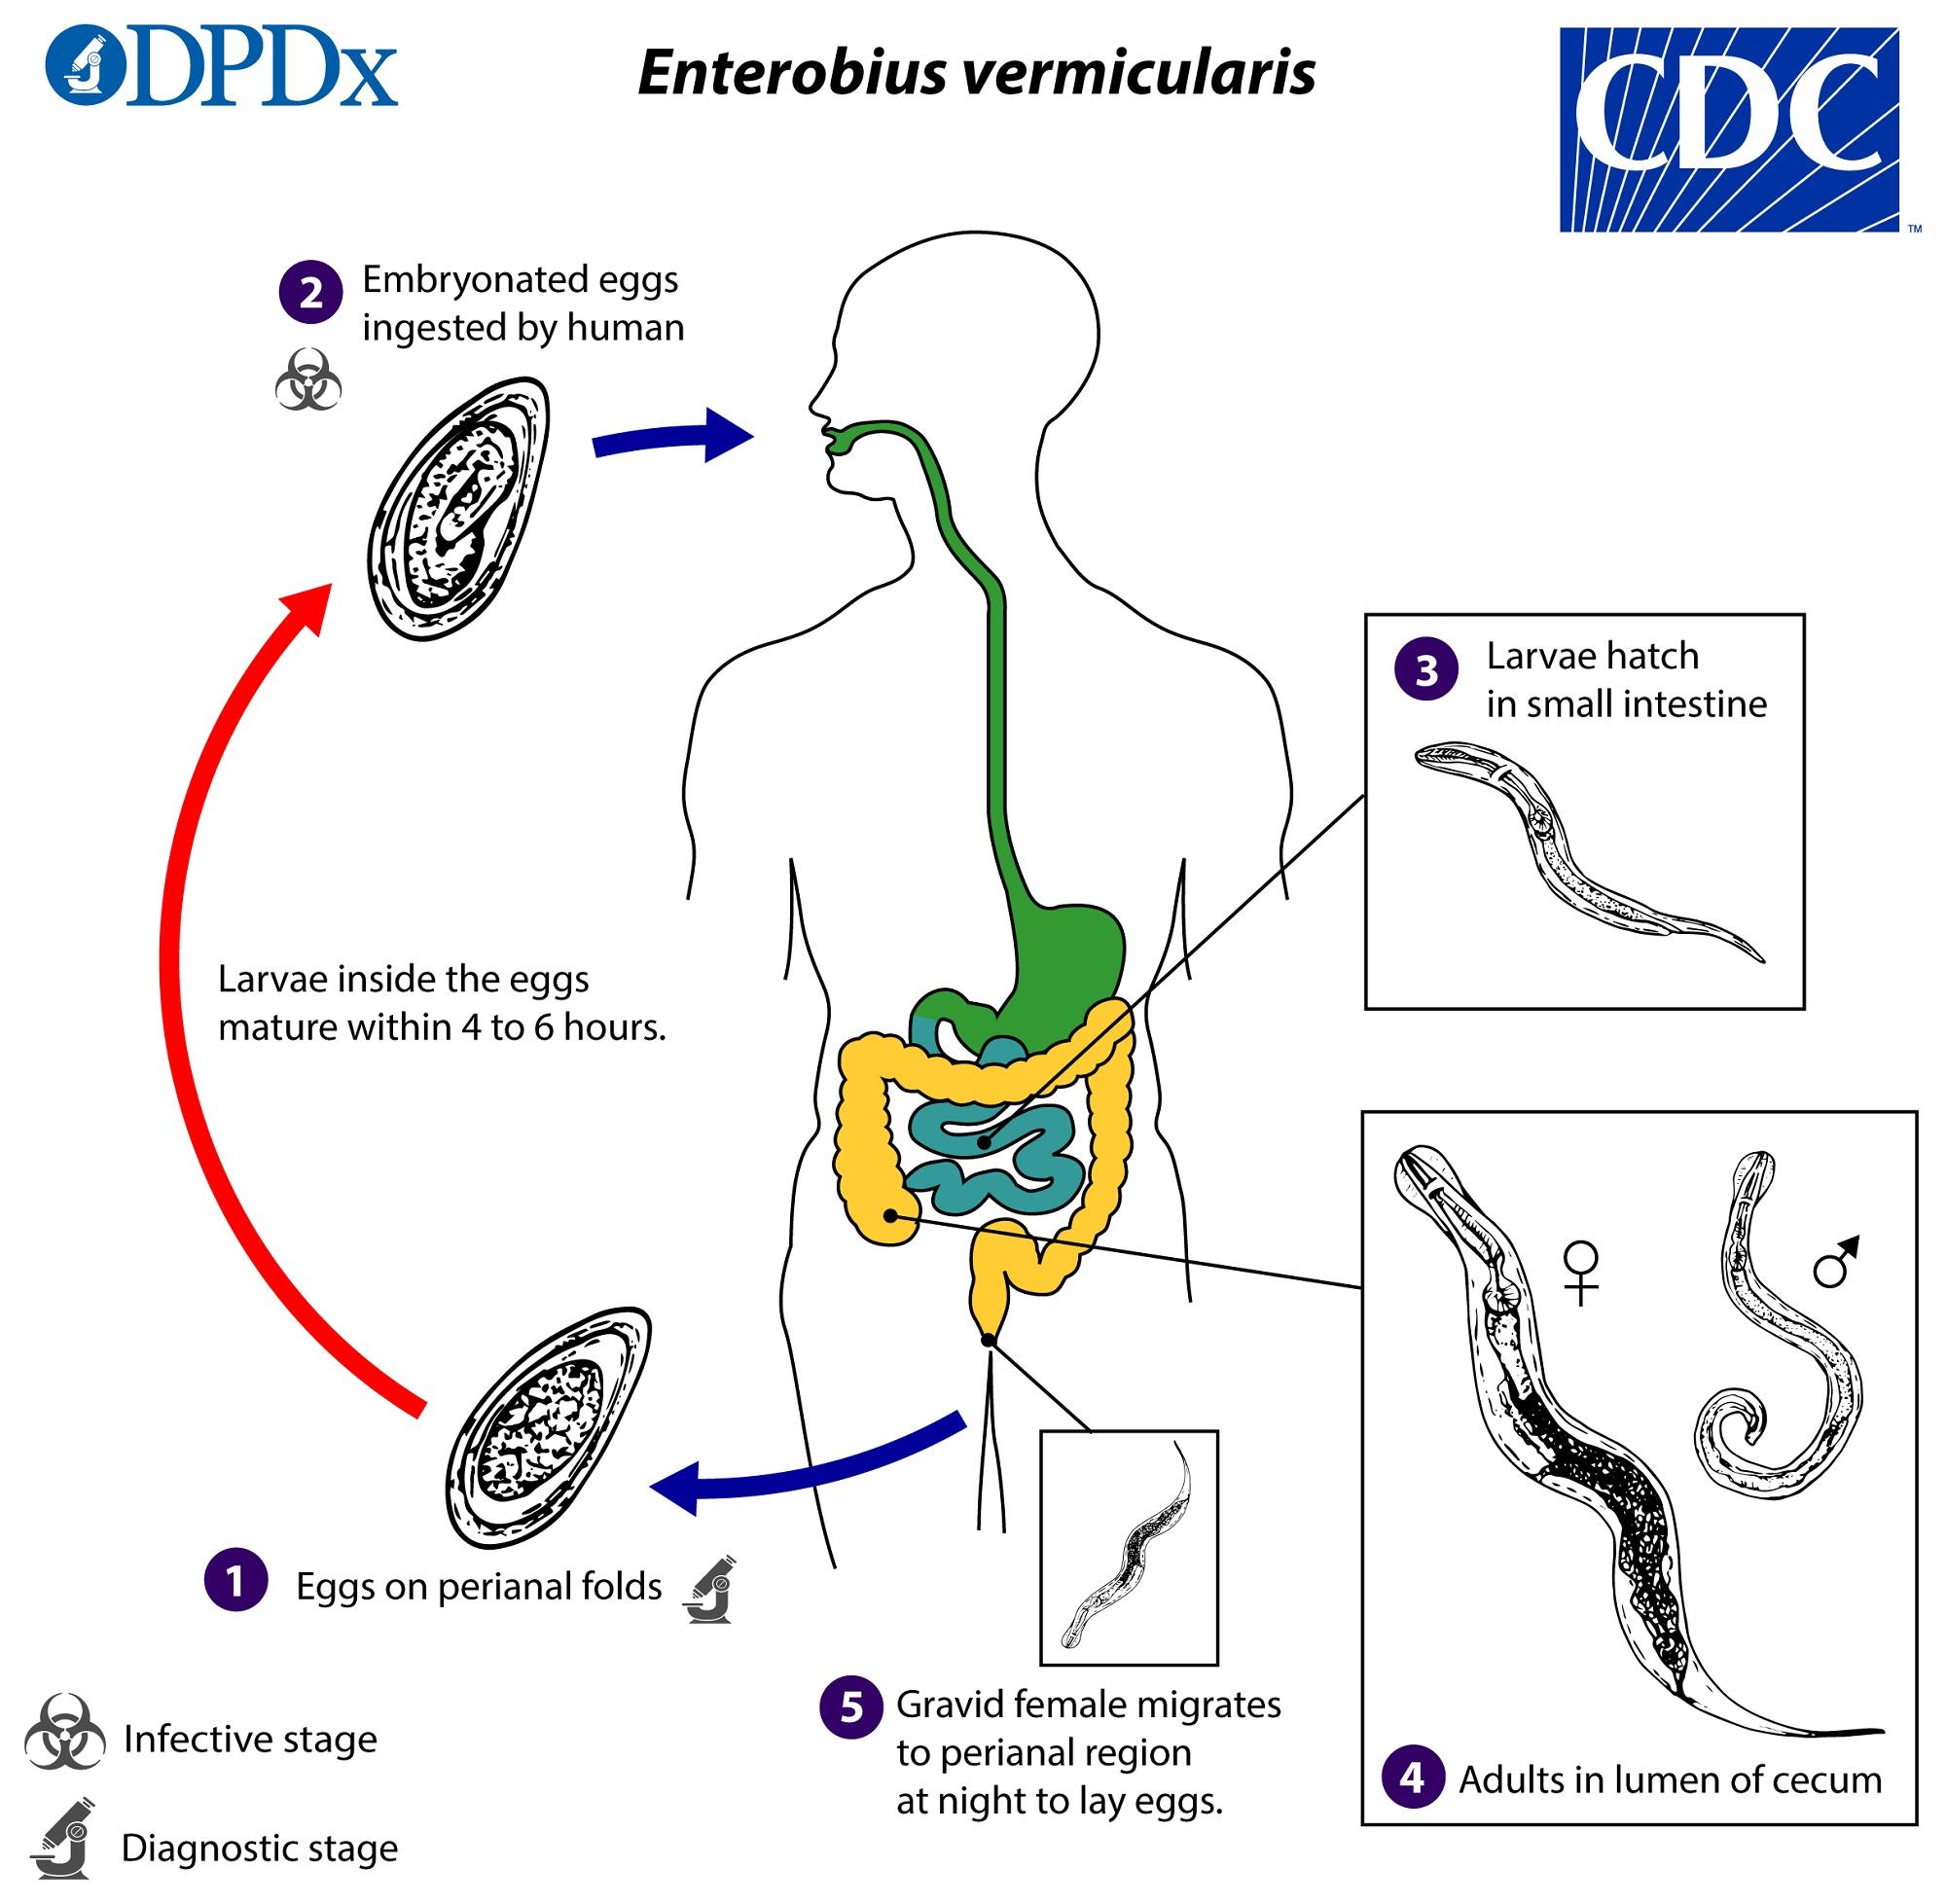 Cdc dpdx paraziták